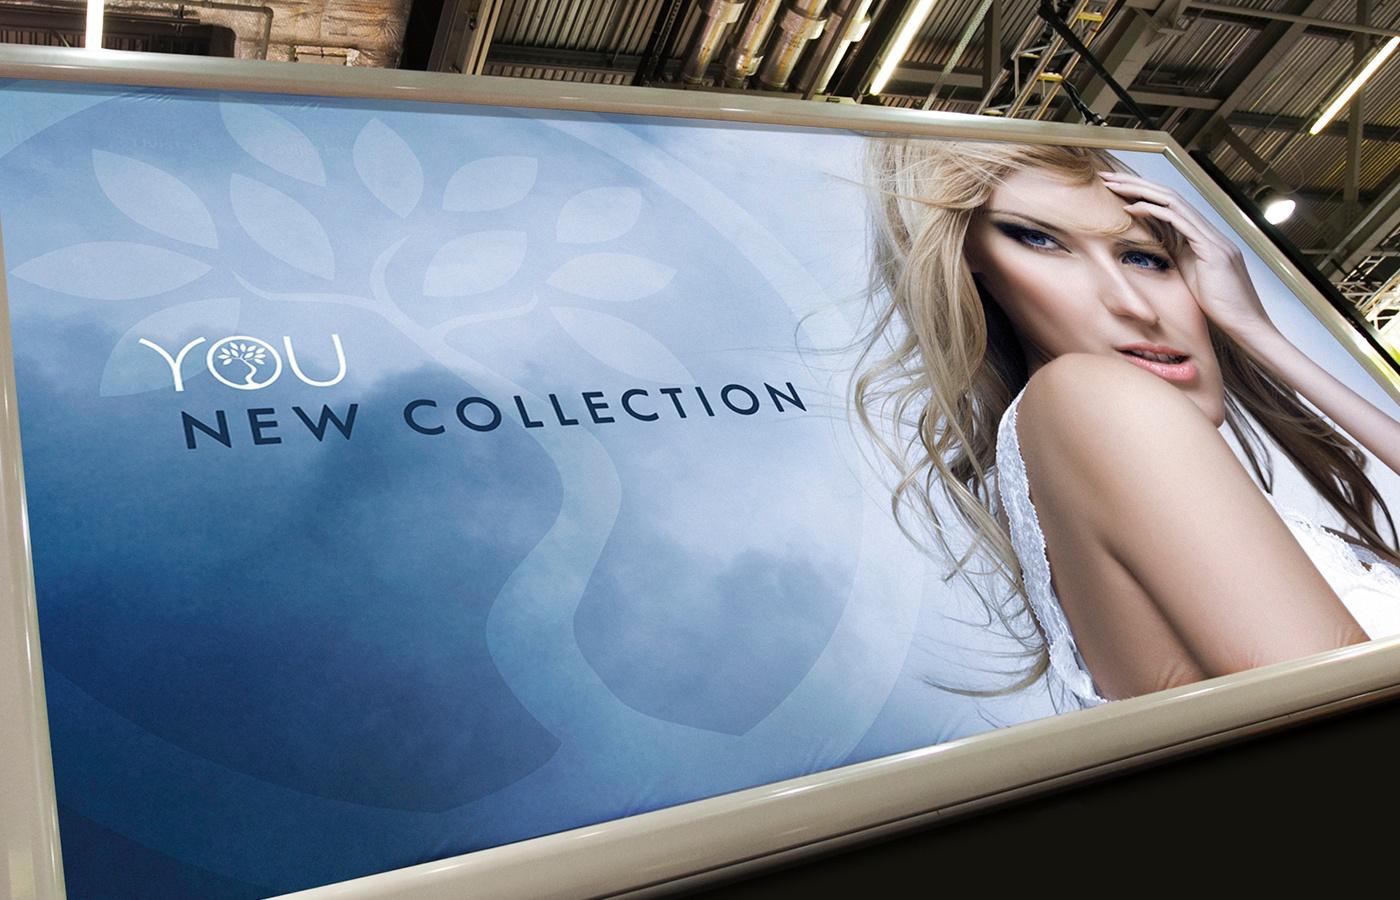 Application-polyethylene-banner-1400-x-900.jpg